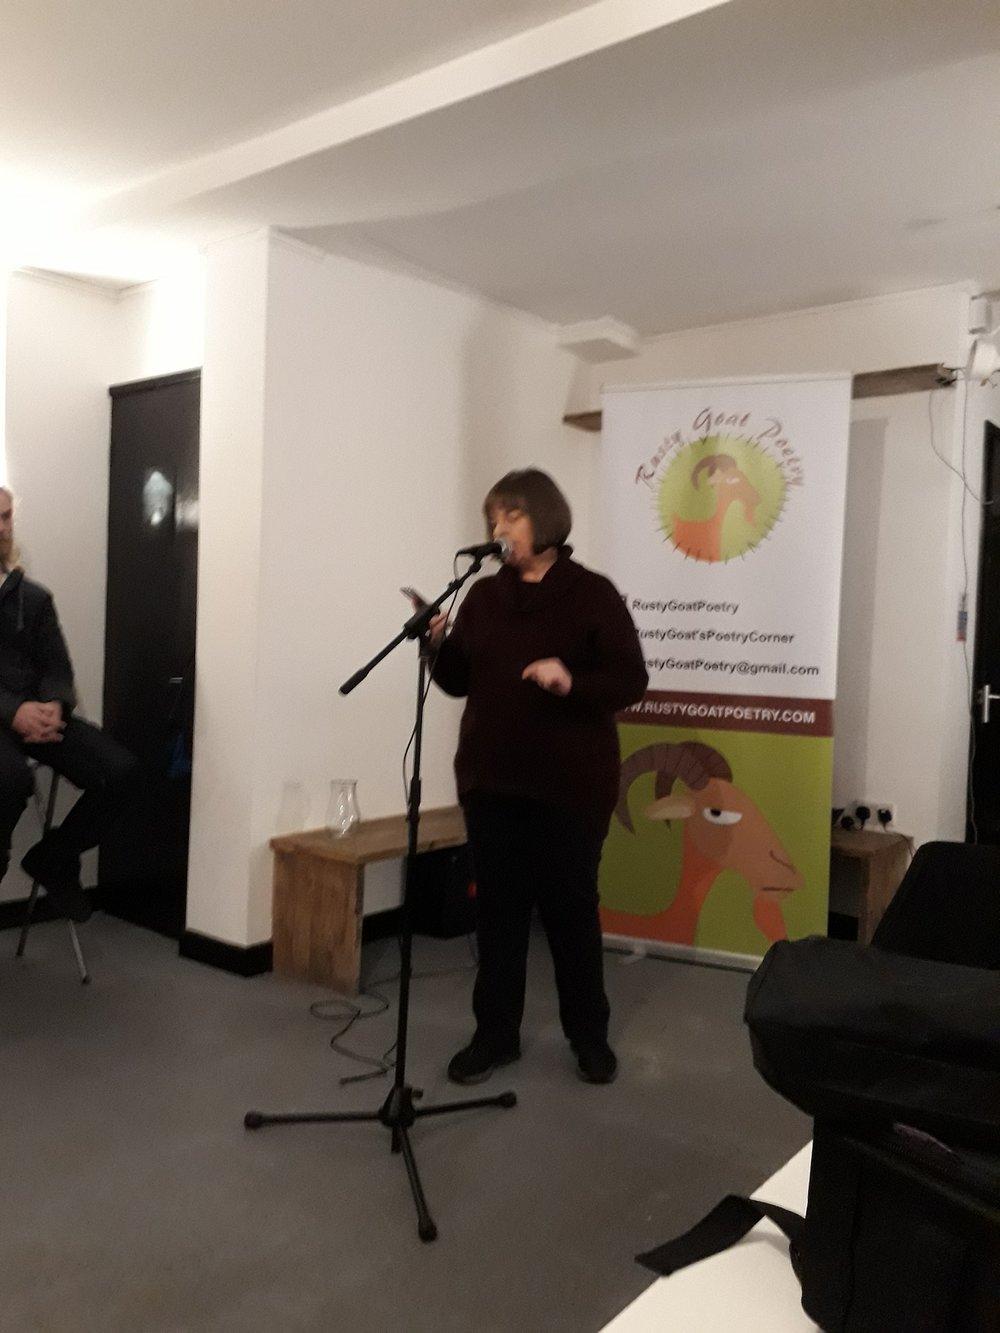 Rust Goats Poetry, Swindon, January 2019